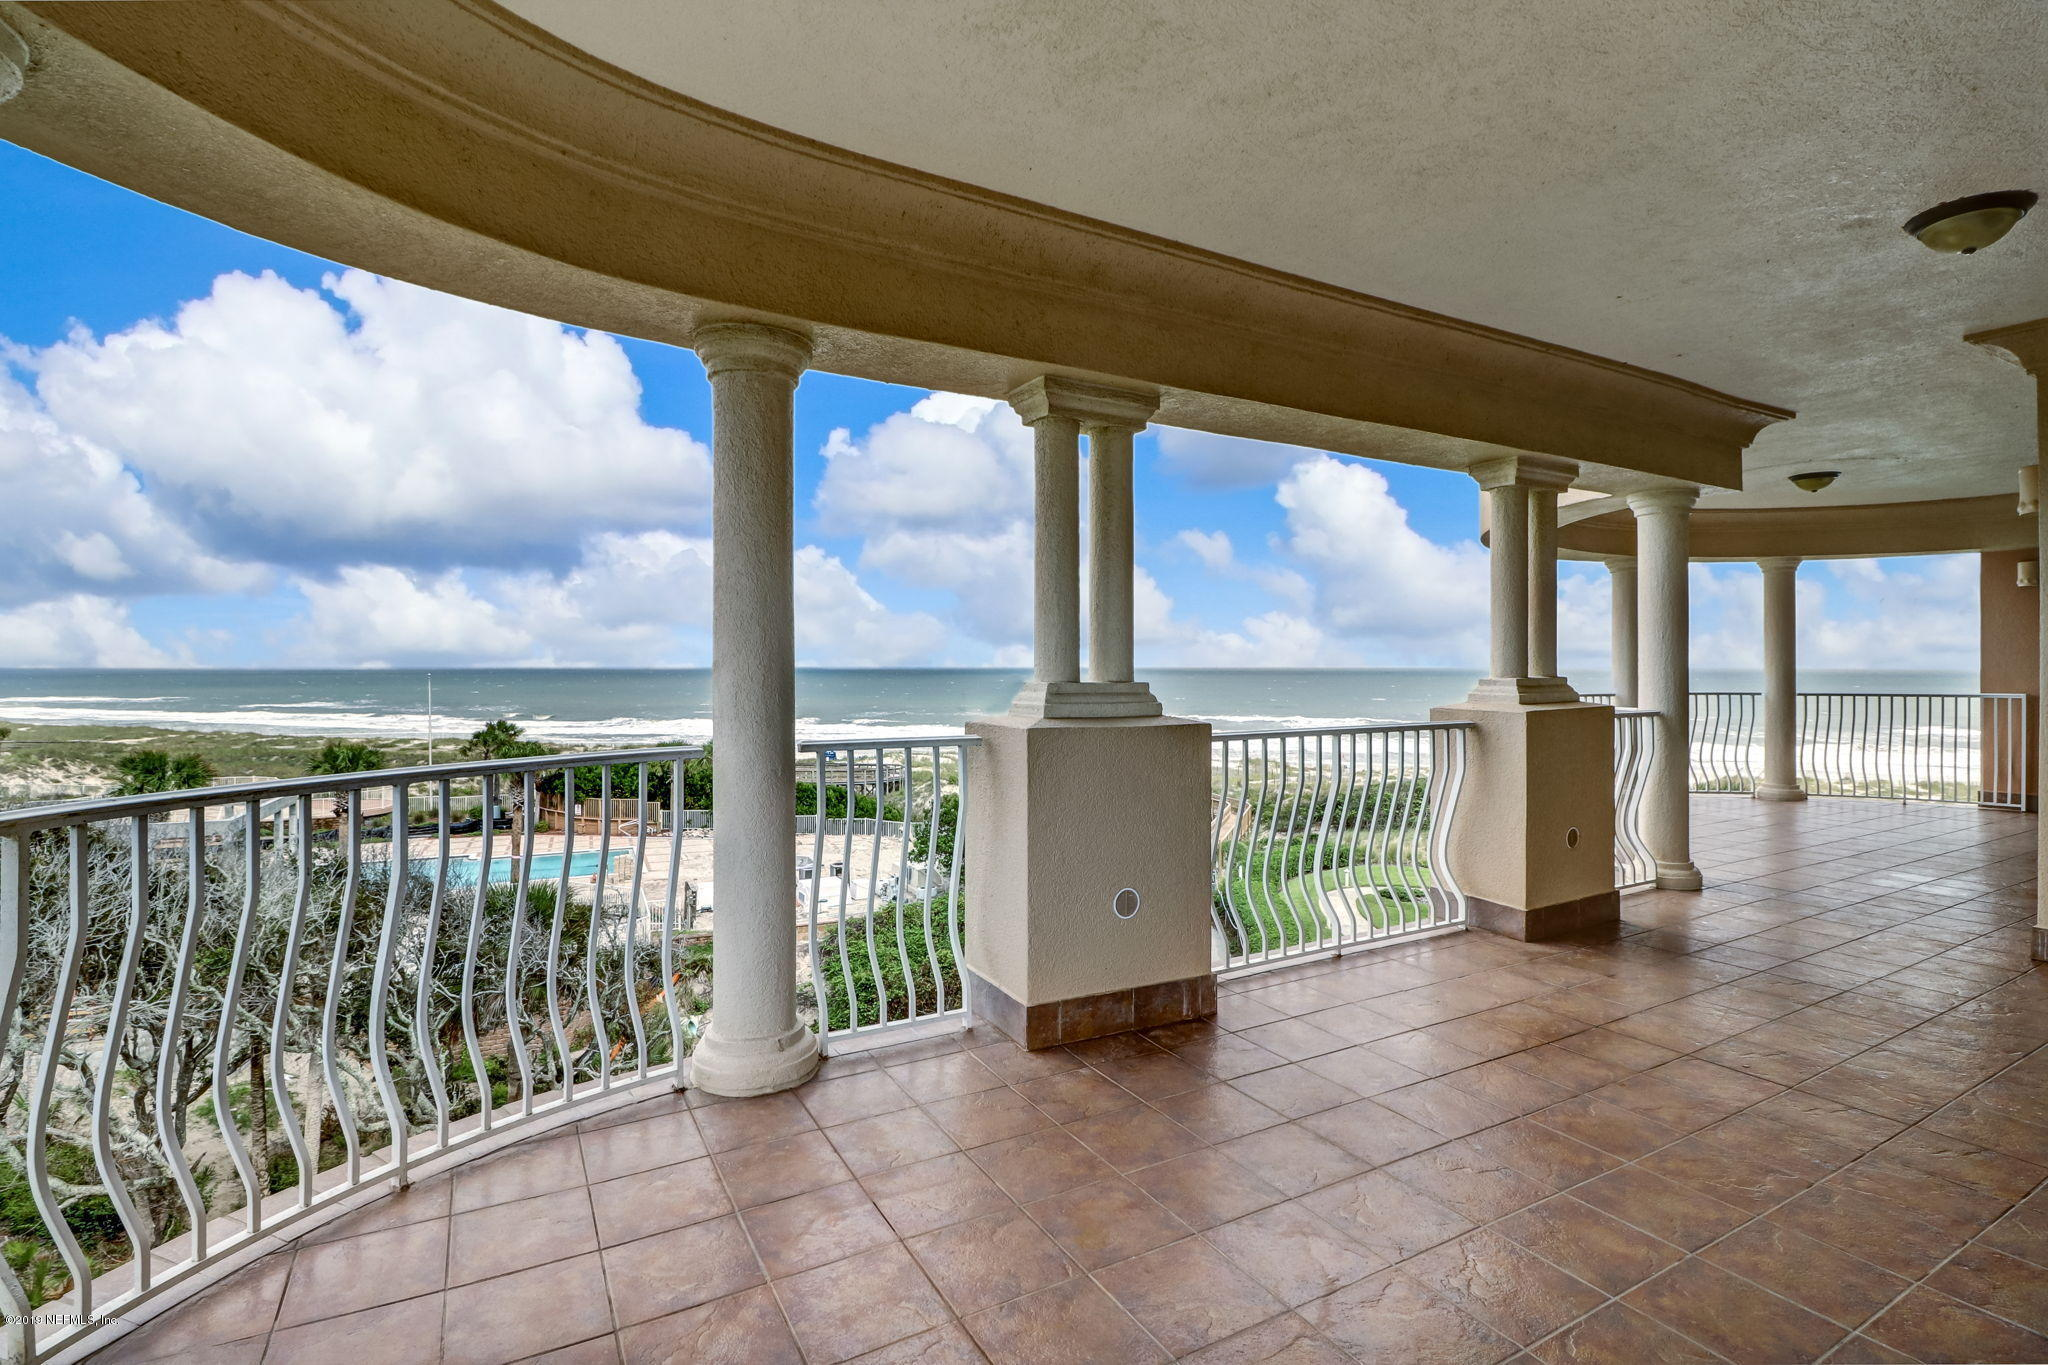 609 OCEAN CLUB, FERNANDINA BEACH, FLORIDA 32034, 4 Bedrooms Bedrooms, ,4 BathroomsBathrooms,Condo,For sale,OCEAN CLUB,1019586